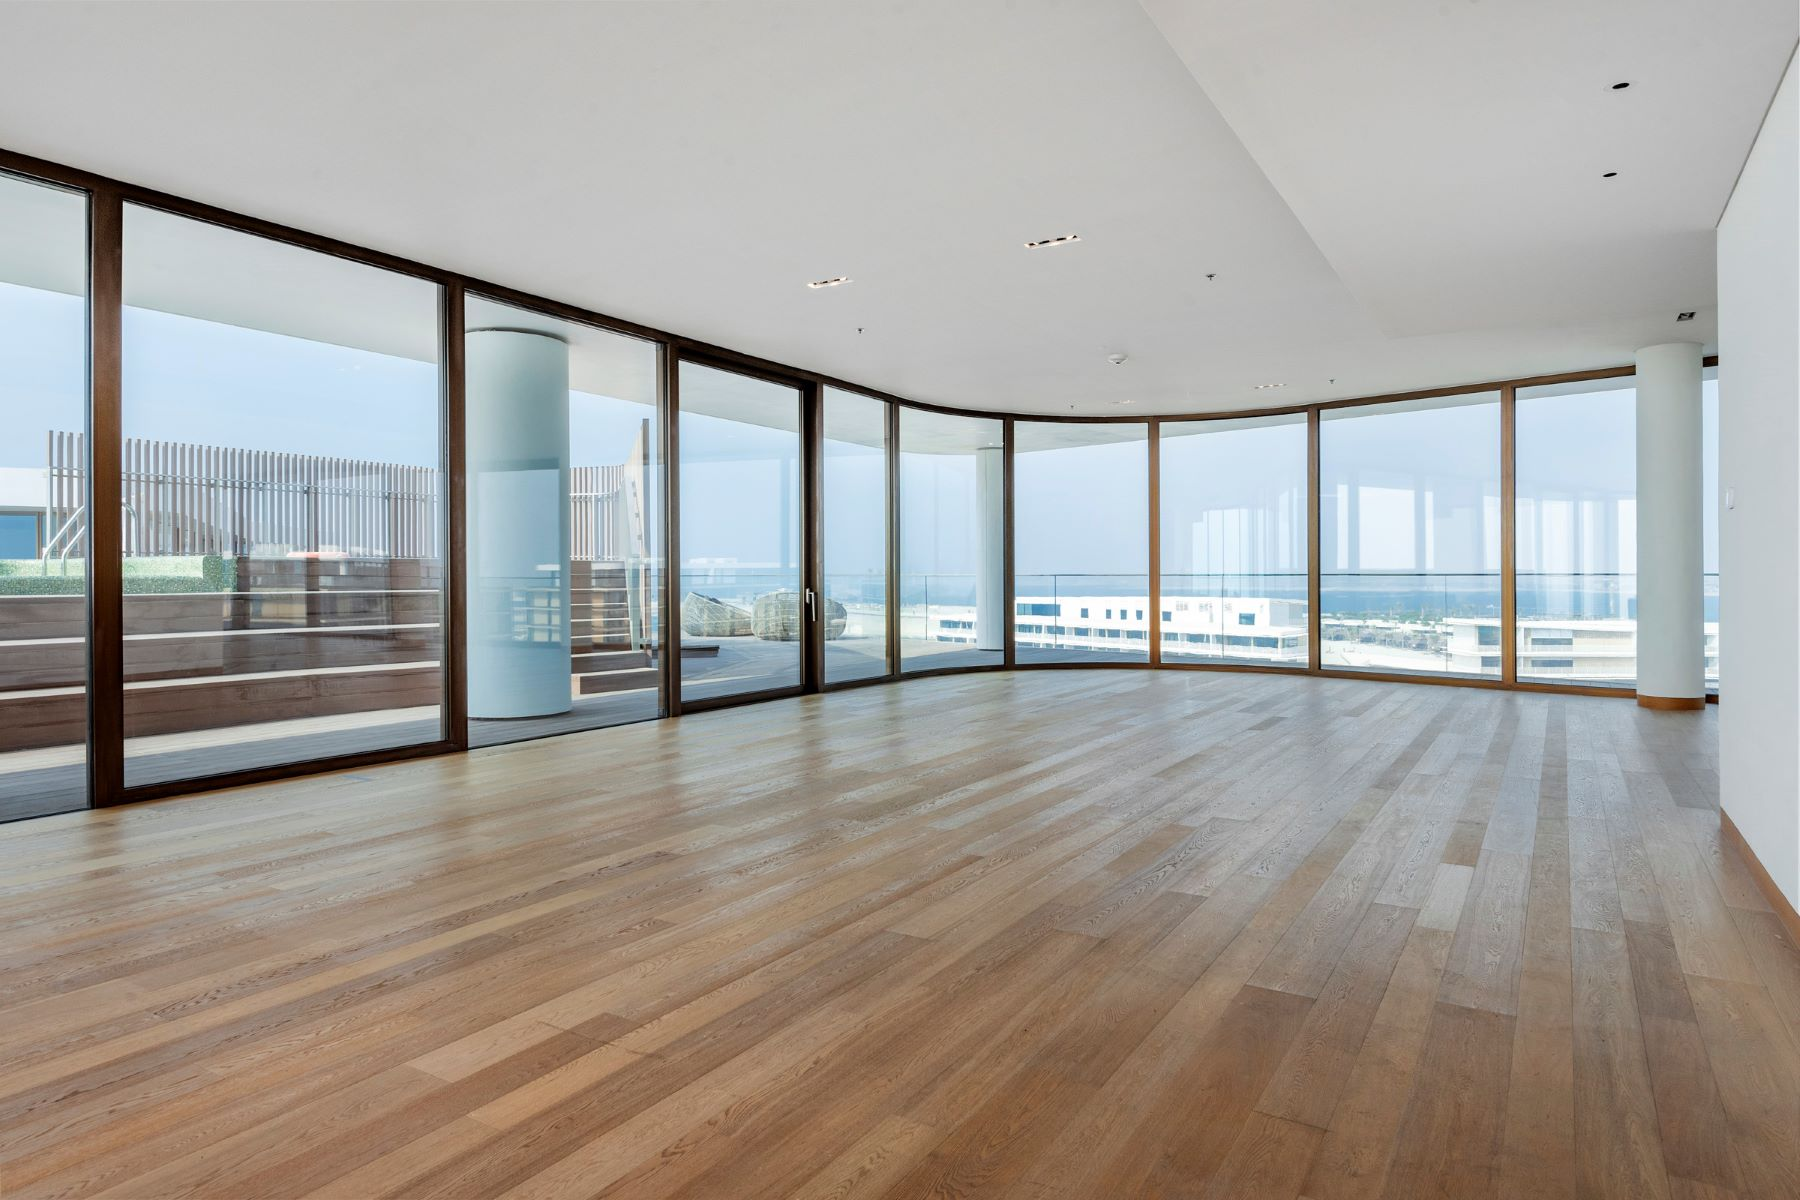 Apartments のために 賃貸 アット 4 Bedroom Rare Full Floor Bvlgari Penthouse. Dubai, ドバイ アラブ首長国連邦